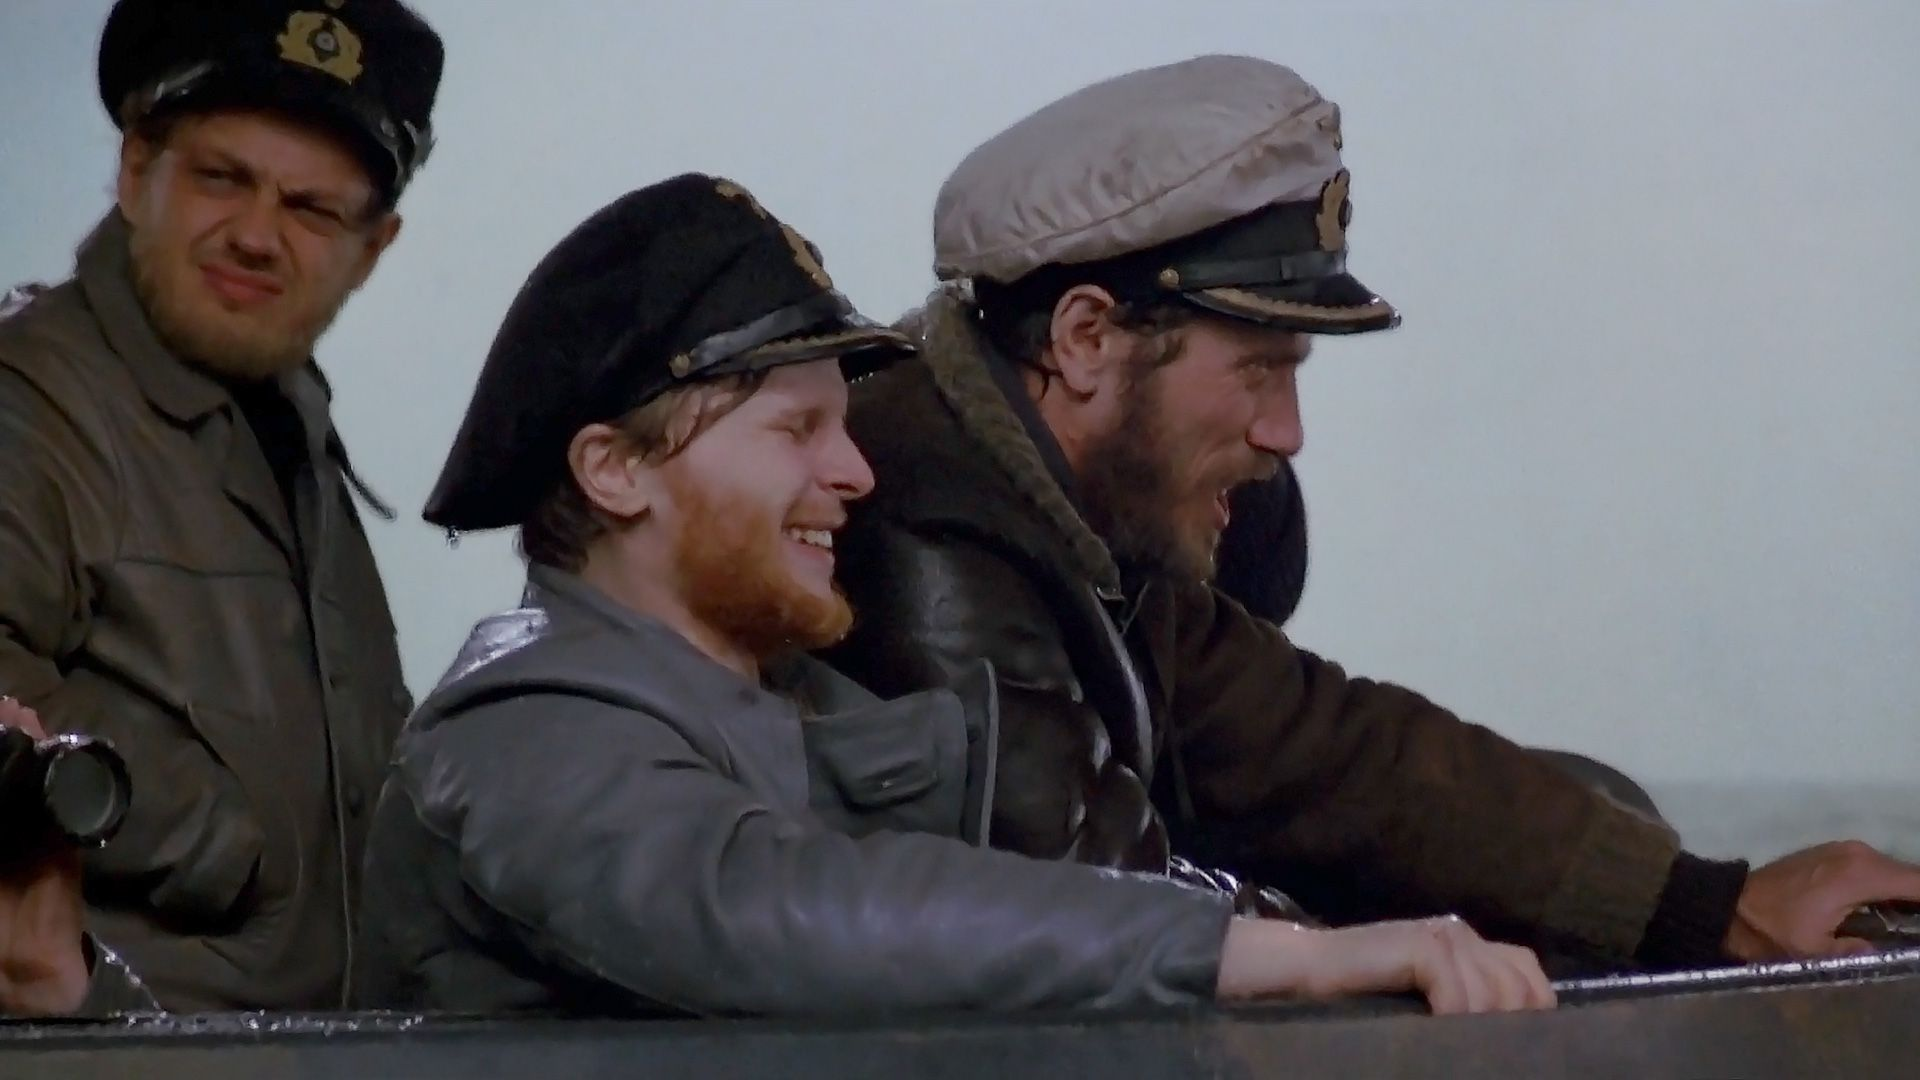 Uwe Ochsenknecht Das Boot